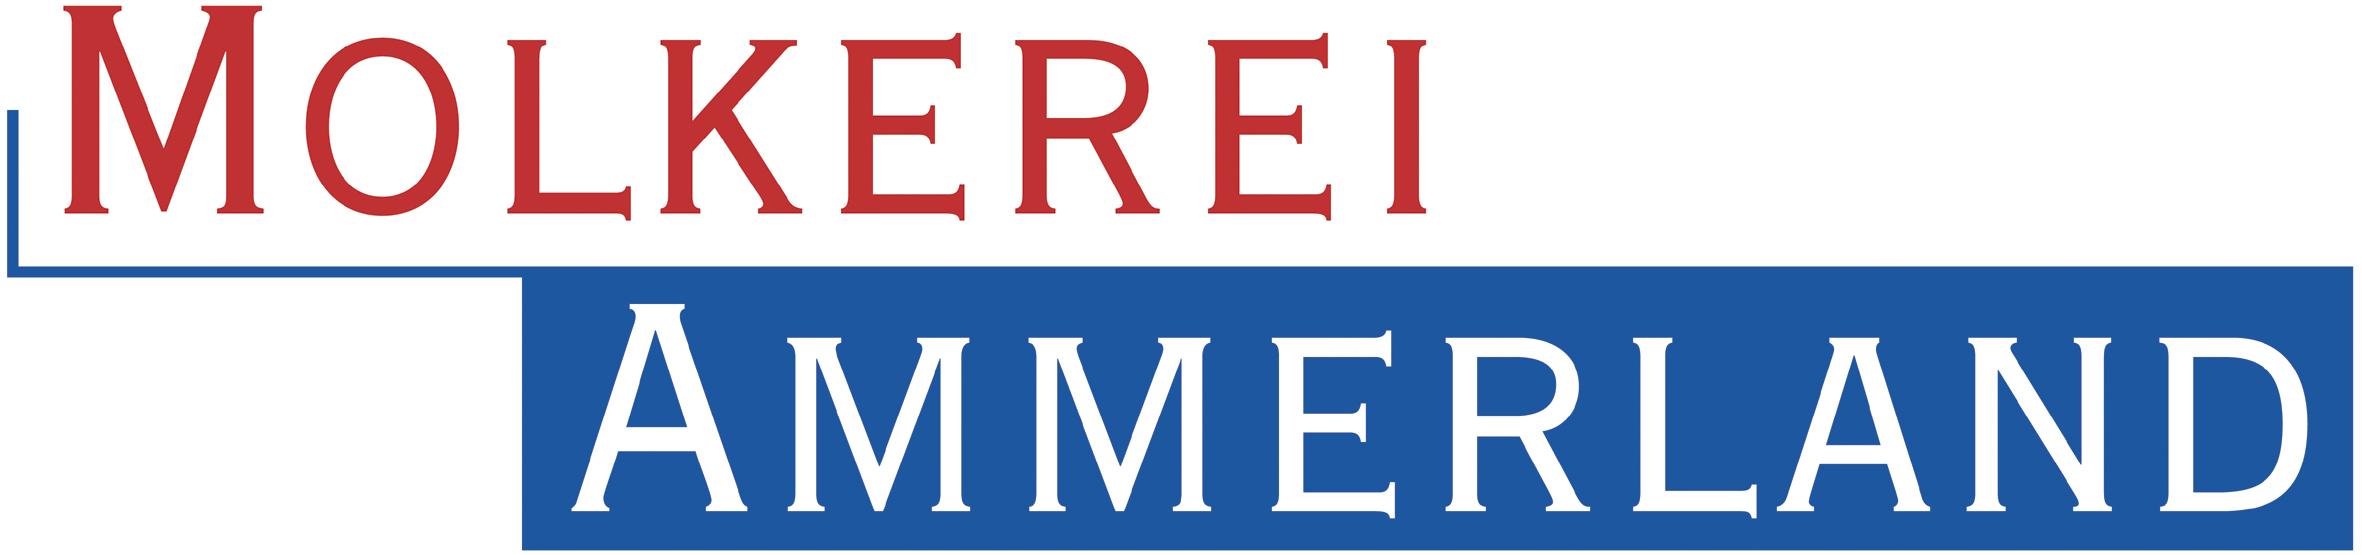 Logo Molkerei Ammerland_20 cm druckf_rgb